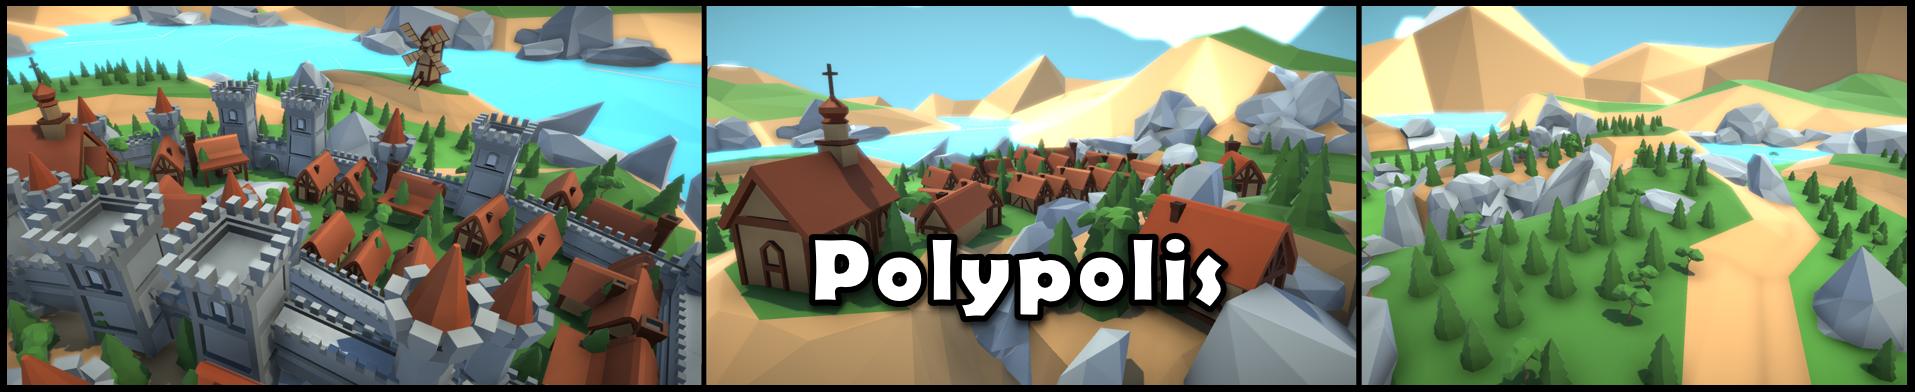 Polypolis